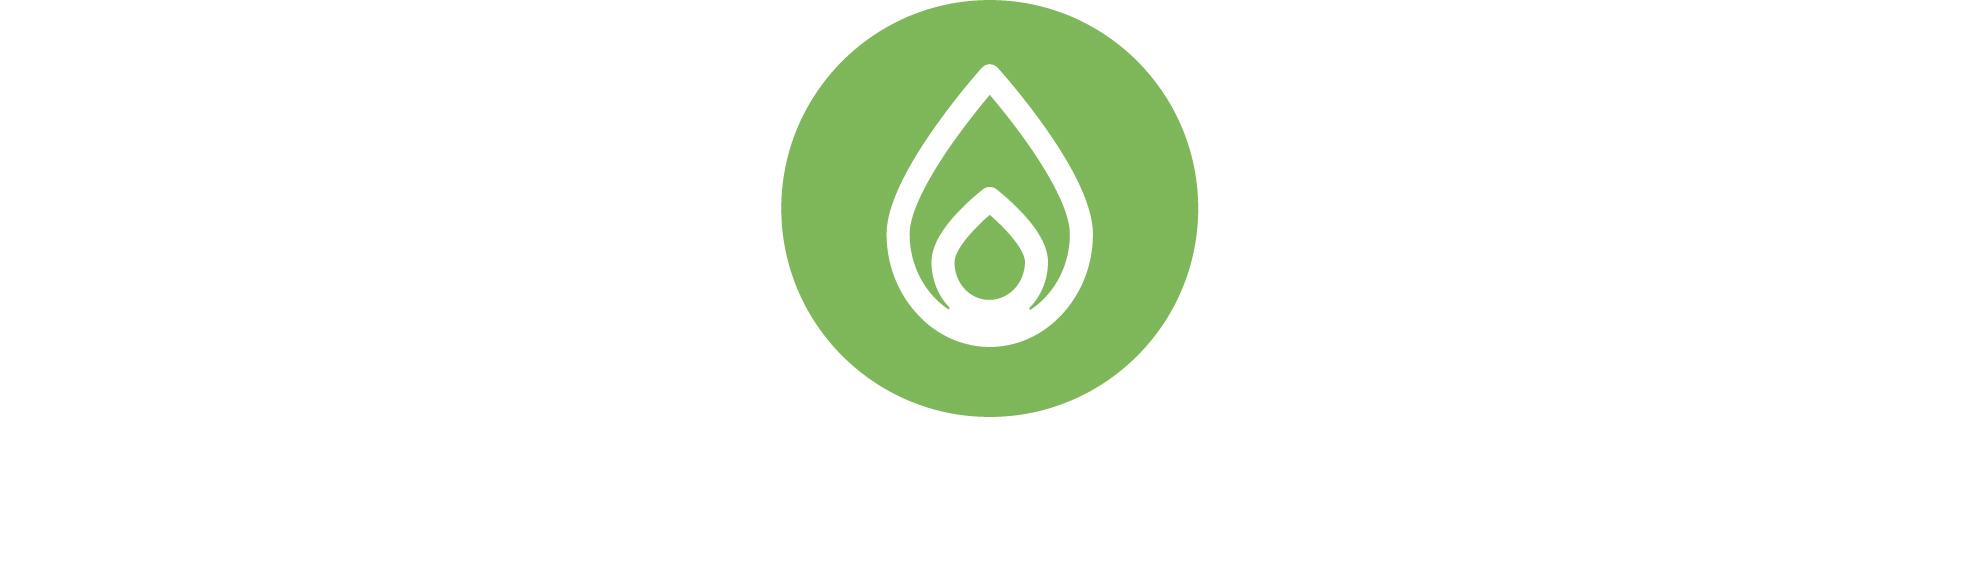 "<a href=""#schritt2"">Grünes LNG mit Biogas aus erneuerbaren Energien</a>"